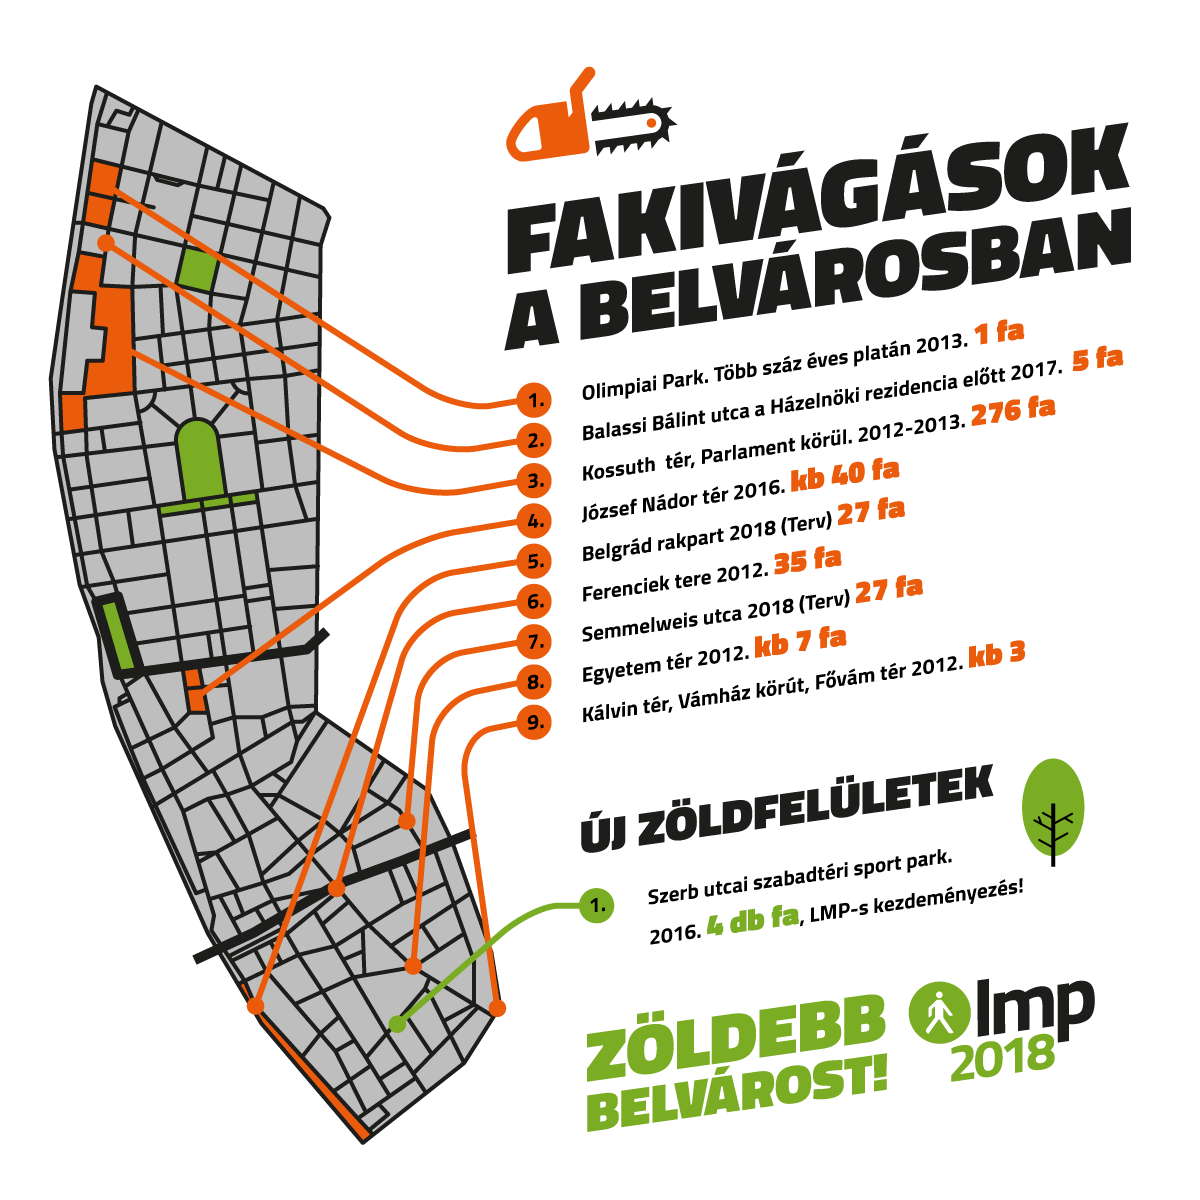 lmp_fakivagas_v_infografika_1200px_x_1200px.png